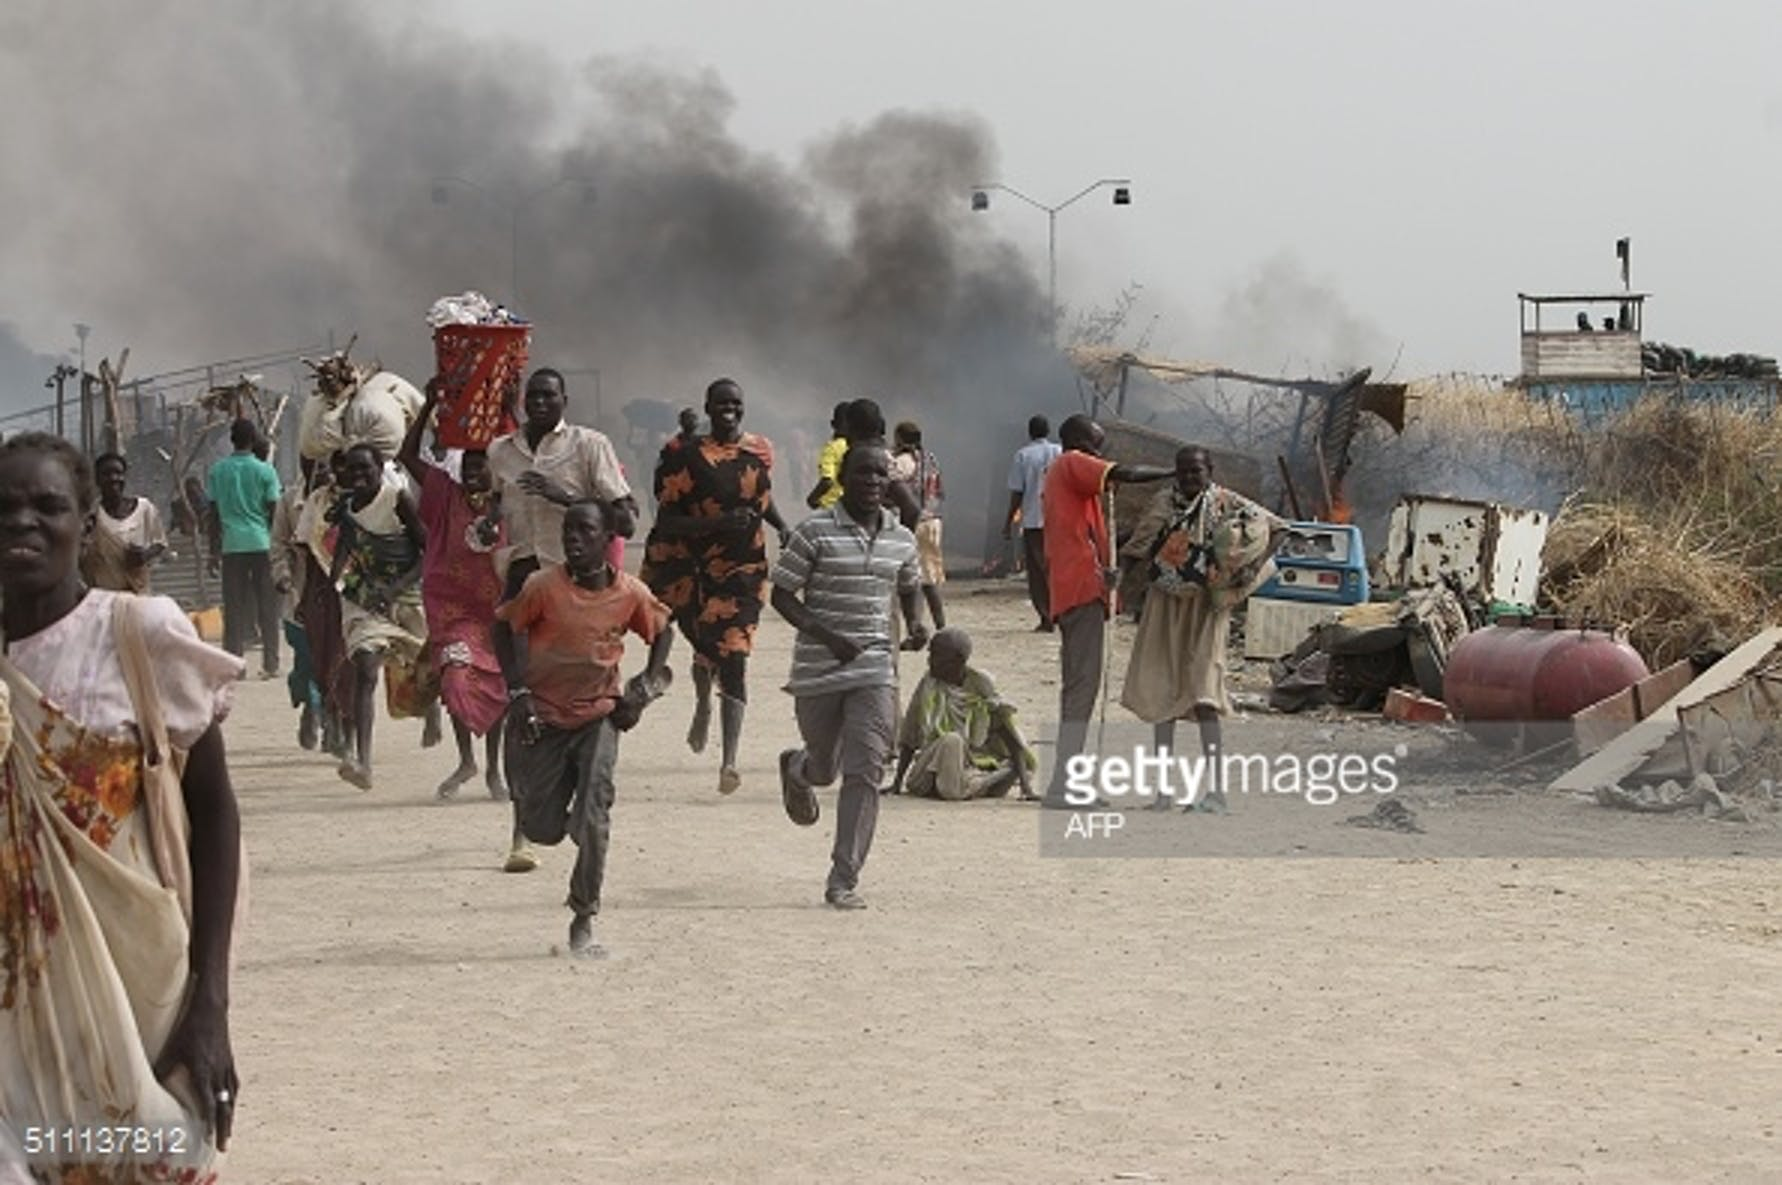 Civili sud sudanesi in fuga dal conflitto  JUSTIN LYNCH/AFP/Getty Images)